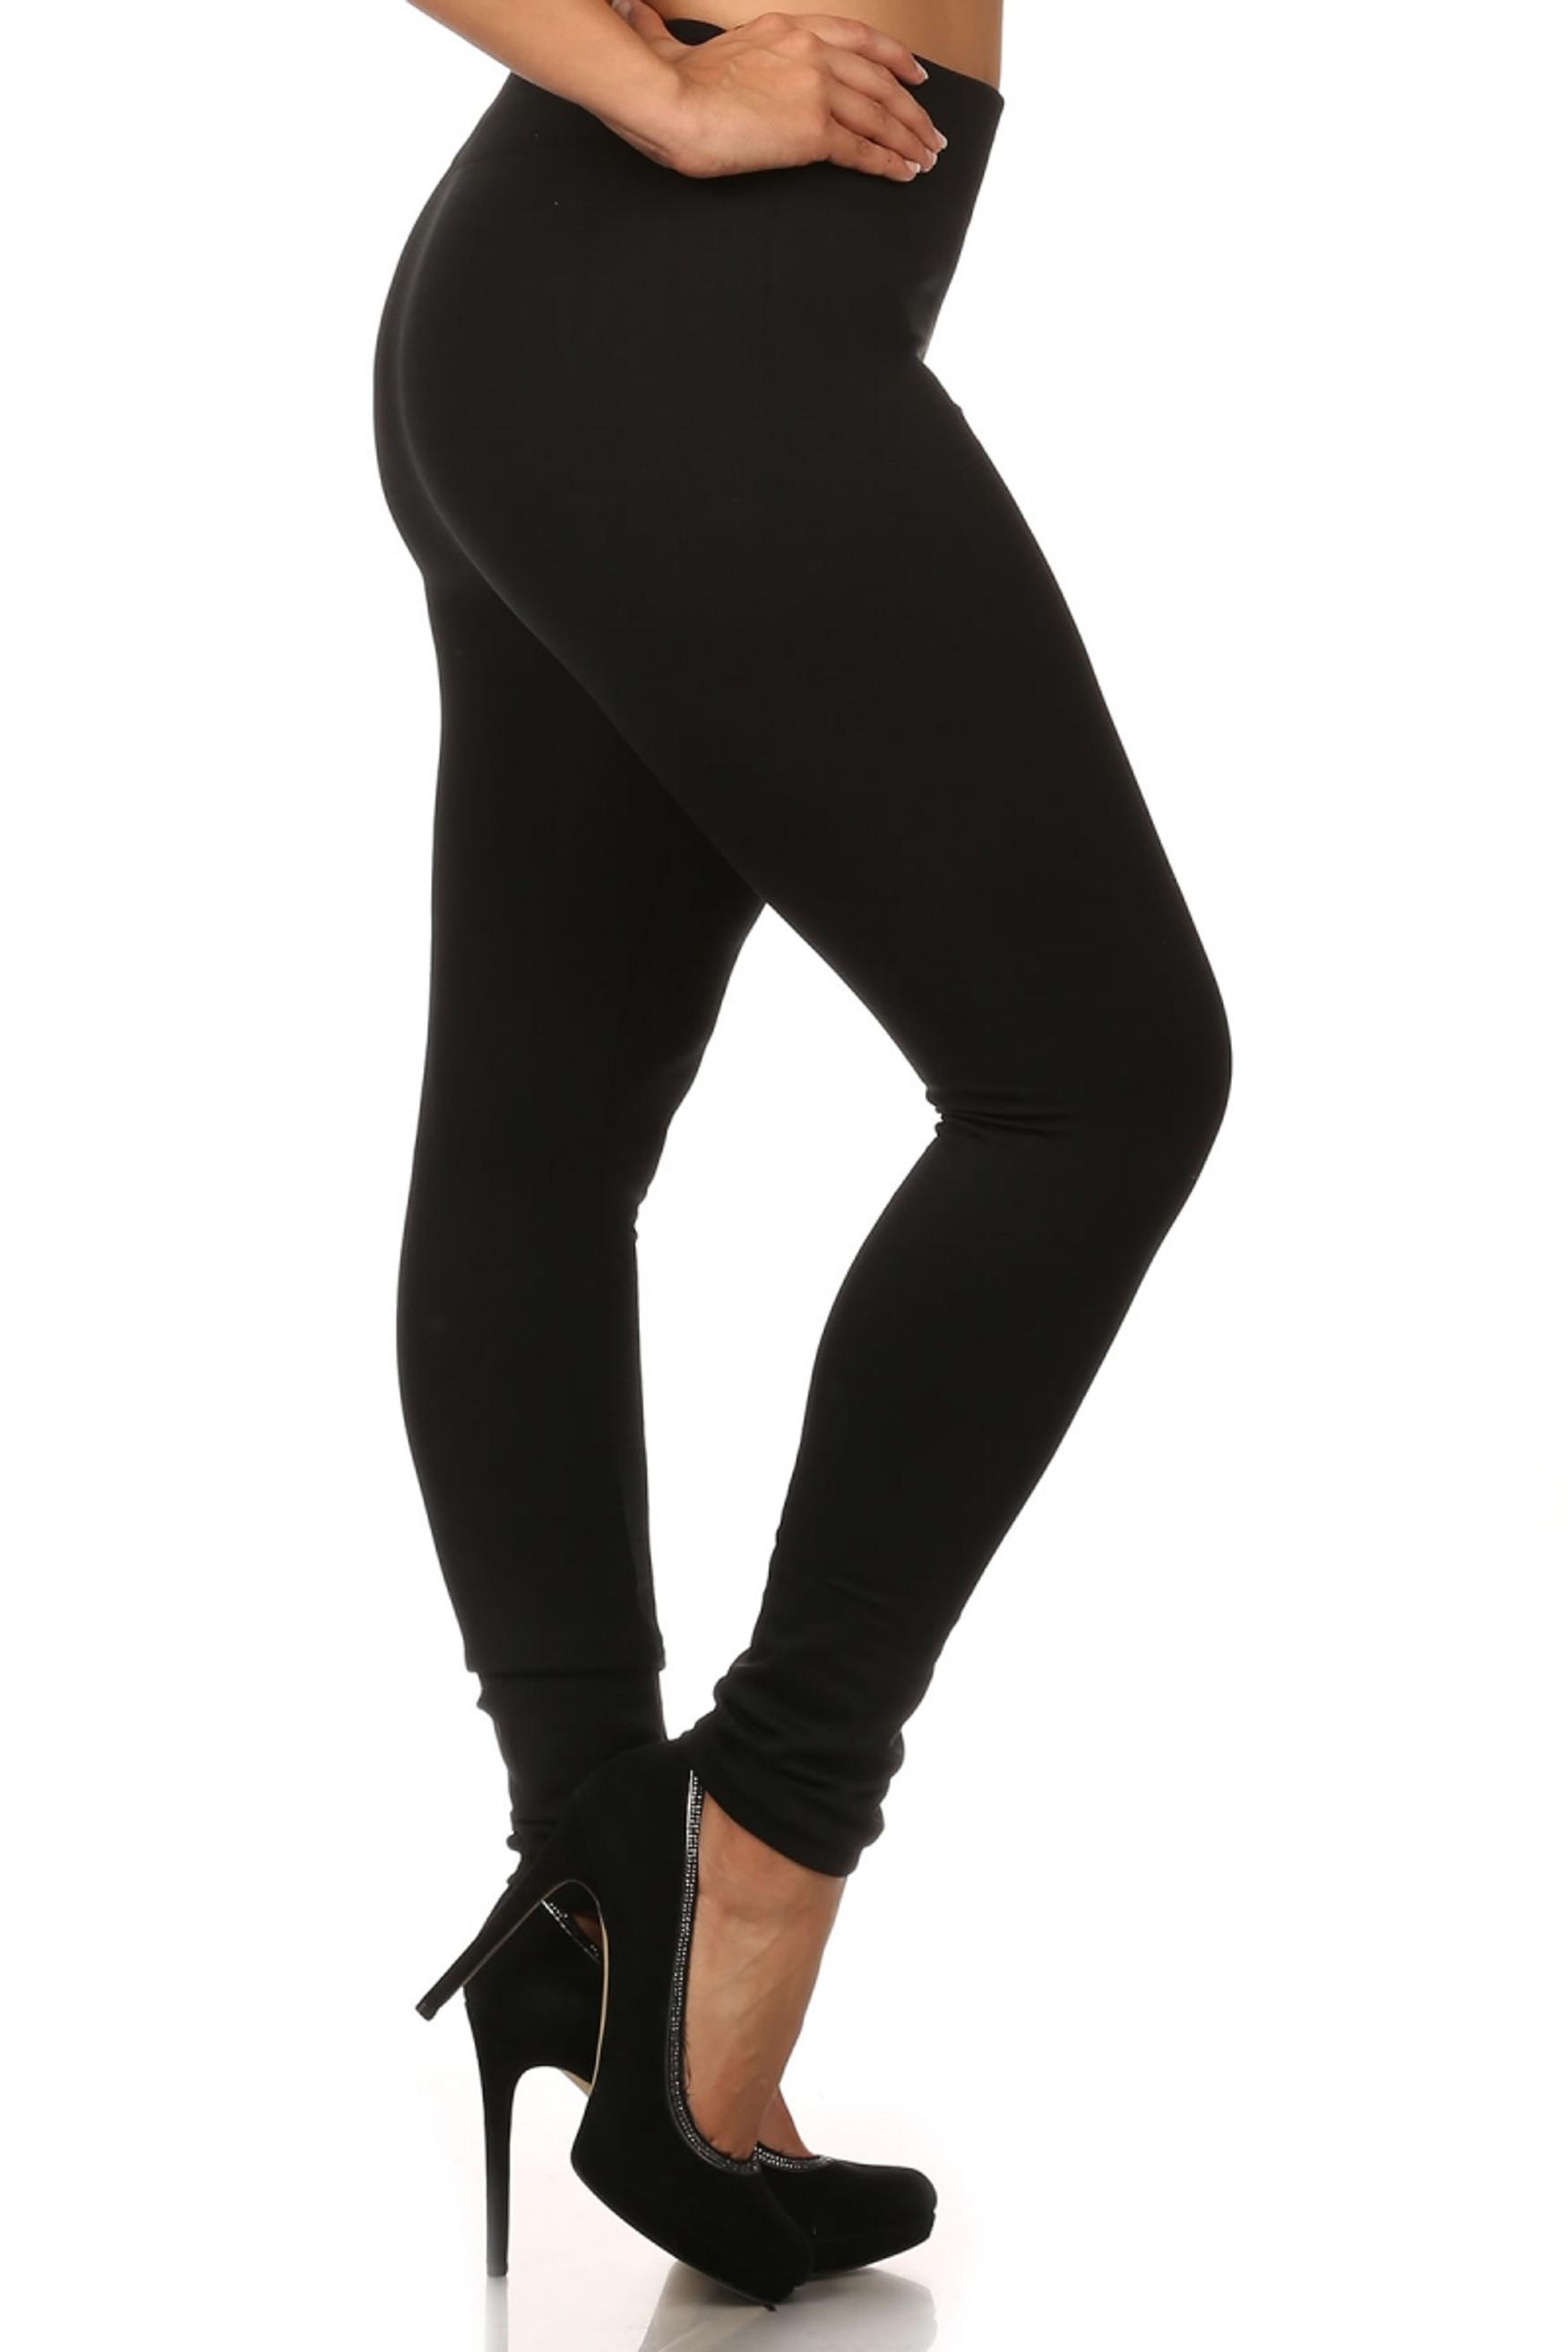 Side Image of Premium Women's Fleece Lined Plus Size Leggings